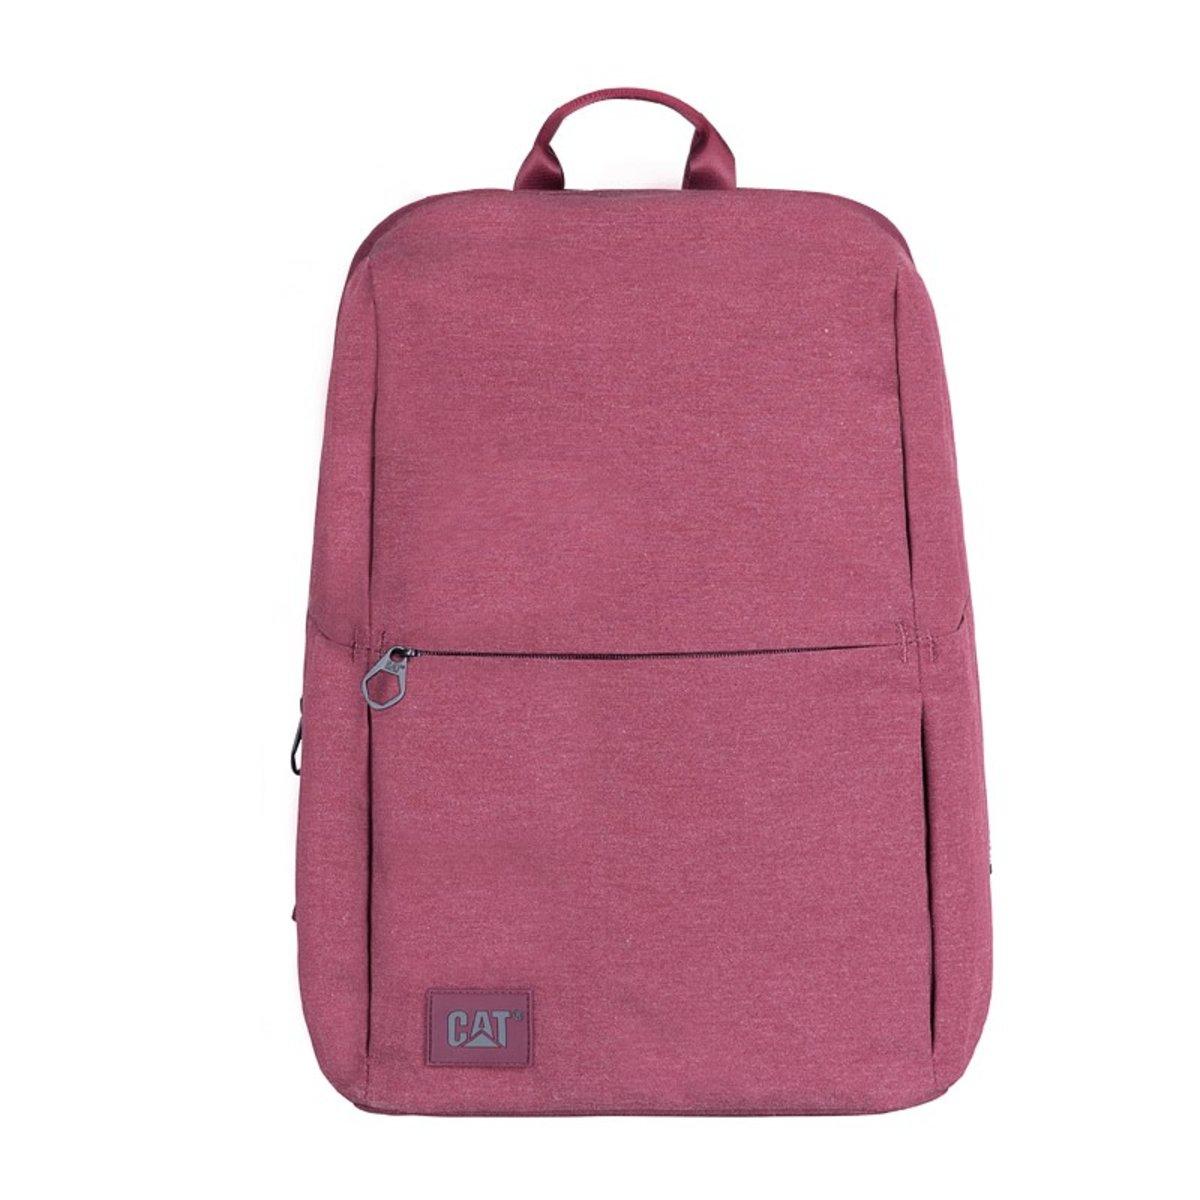 Mono Inno Backpack  - Tawny Port